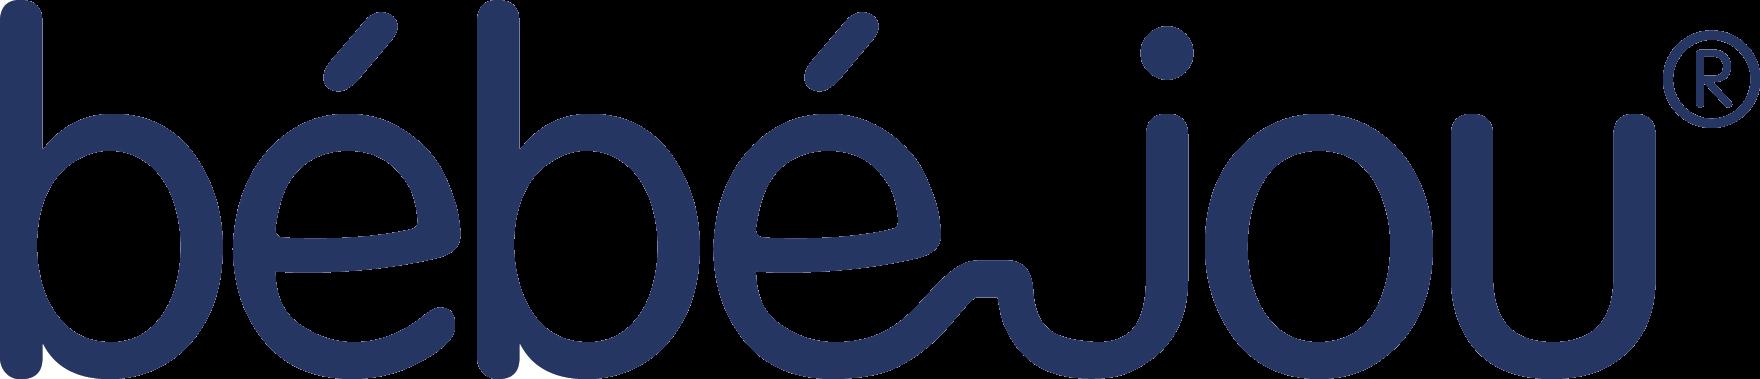 bebe-jou logo